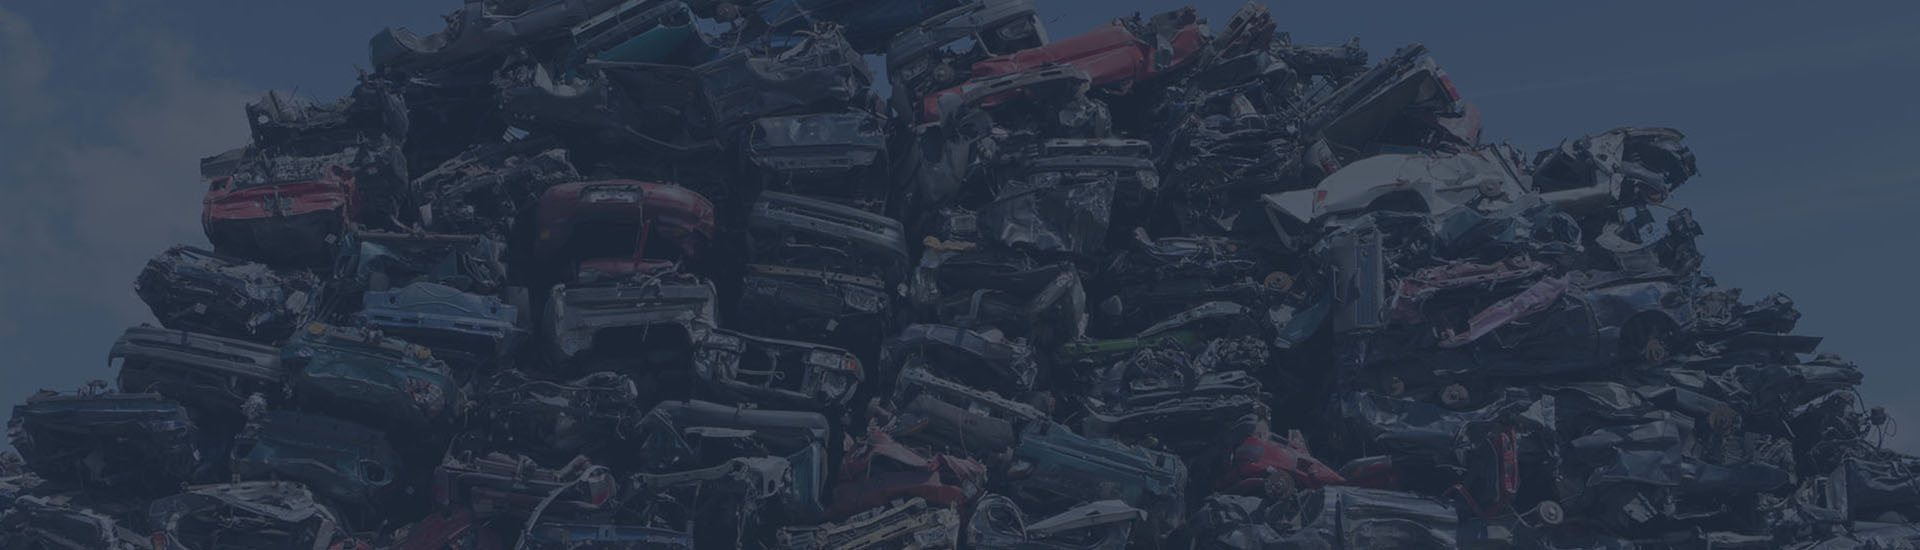 Scrap My Car Stockport